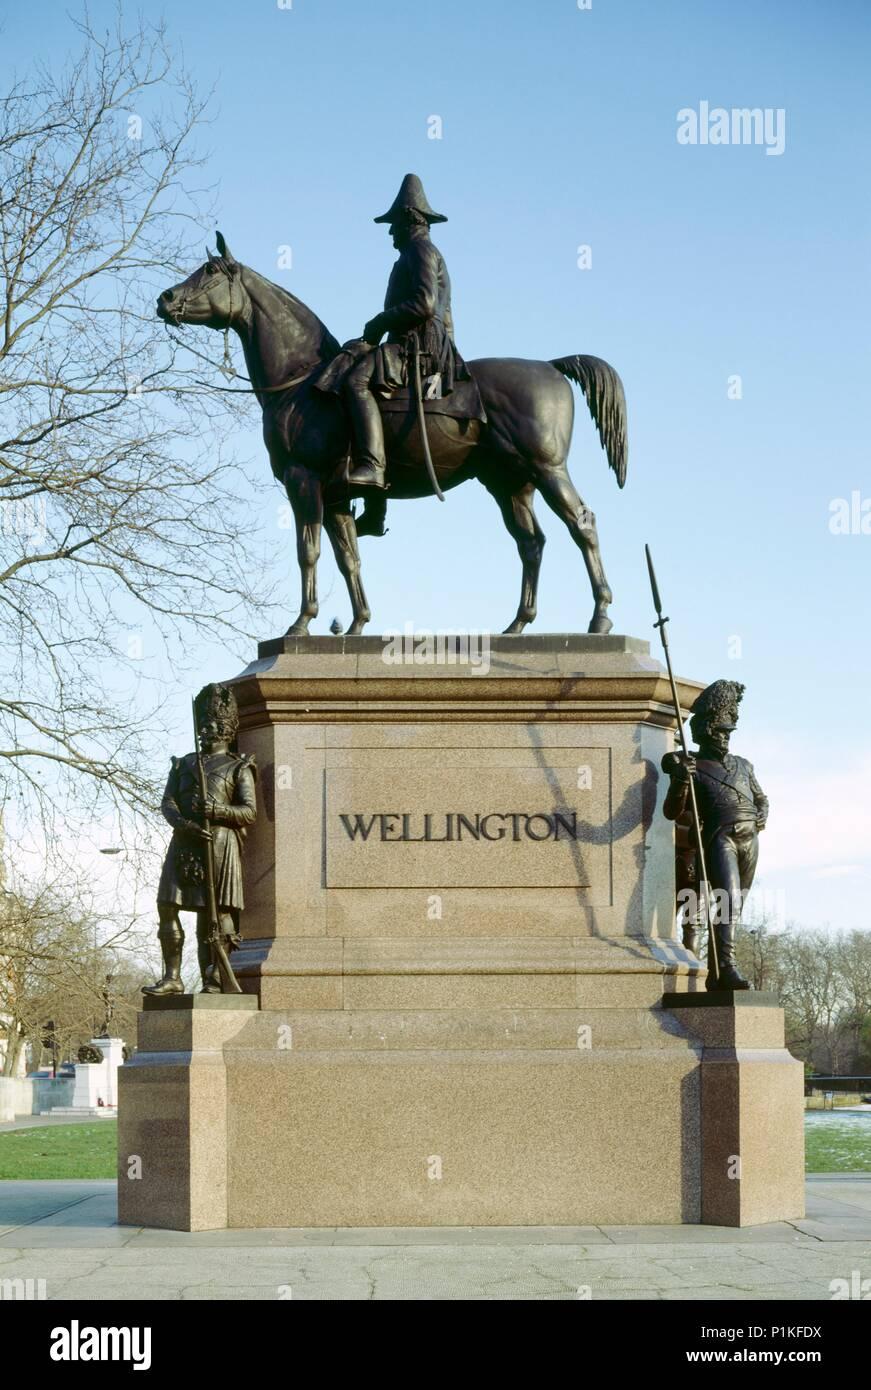 Statue of the Duke of Wellington, Hyde Park Corner, London, c1980-c2017. Bronze equestrian statue designed in 1888 by Joseph Edgar Boehm. - Stock Image